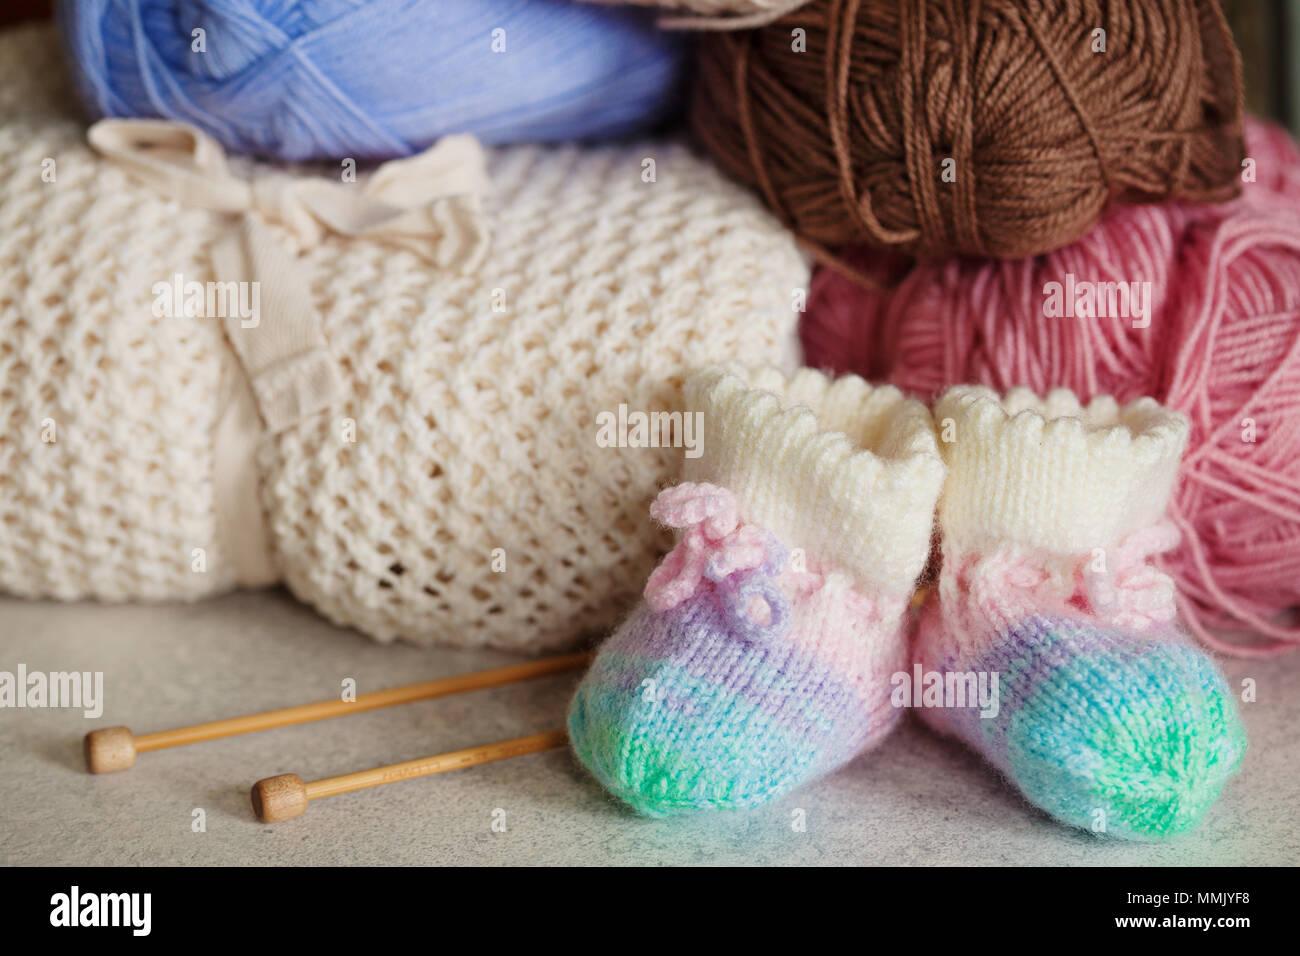 b1c80ca4f8f1 Cute handmade baby clothes for girl s birth. Wowen wrap